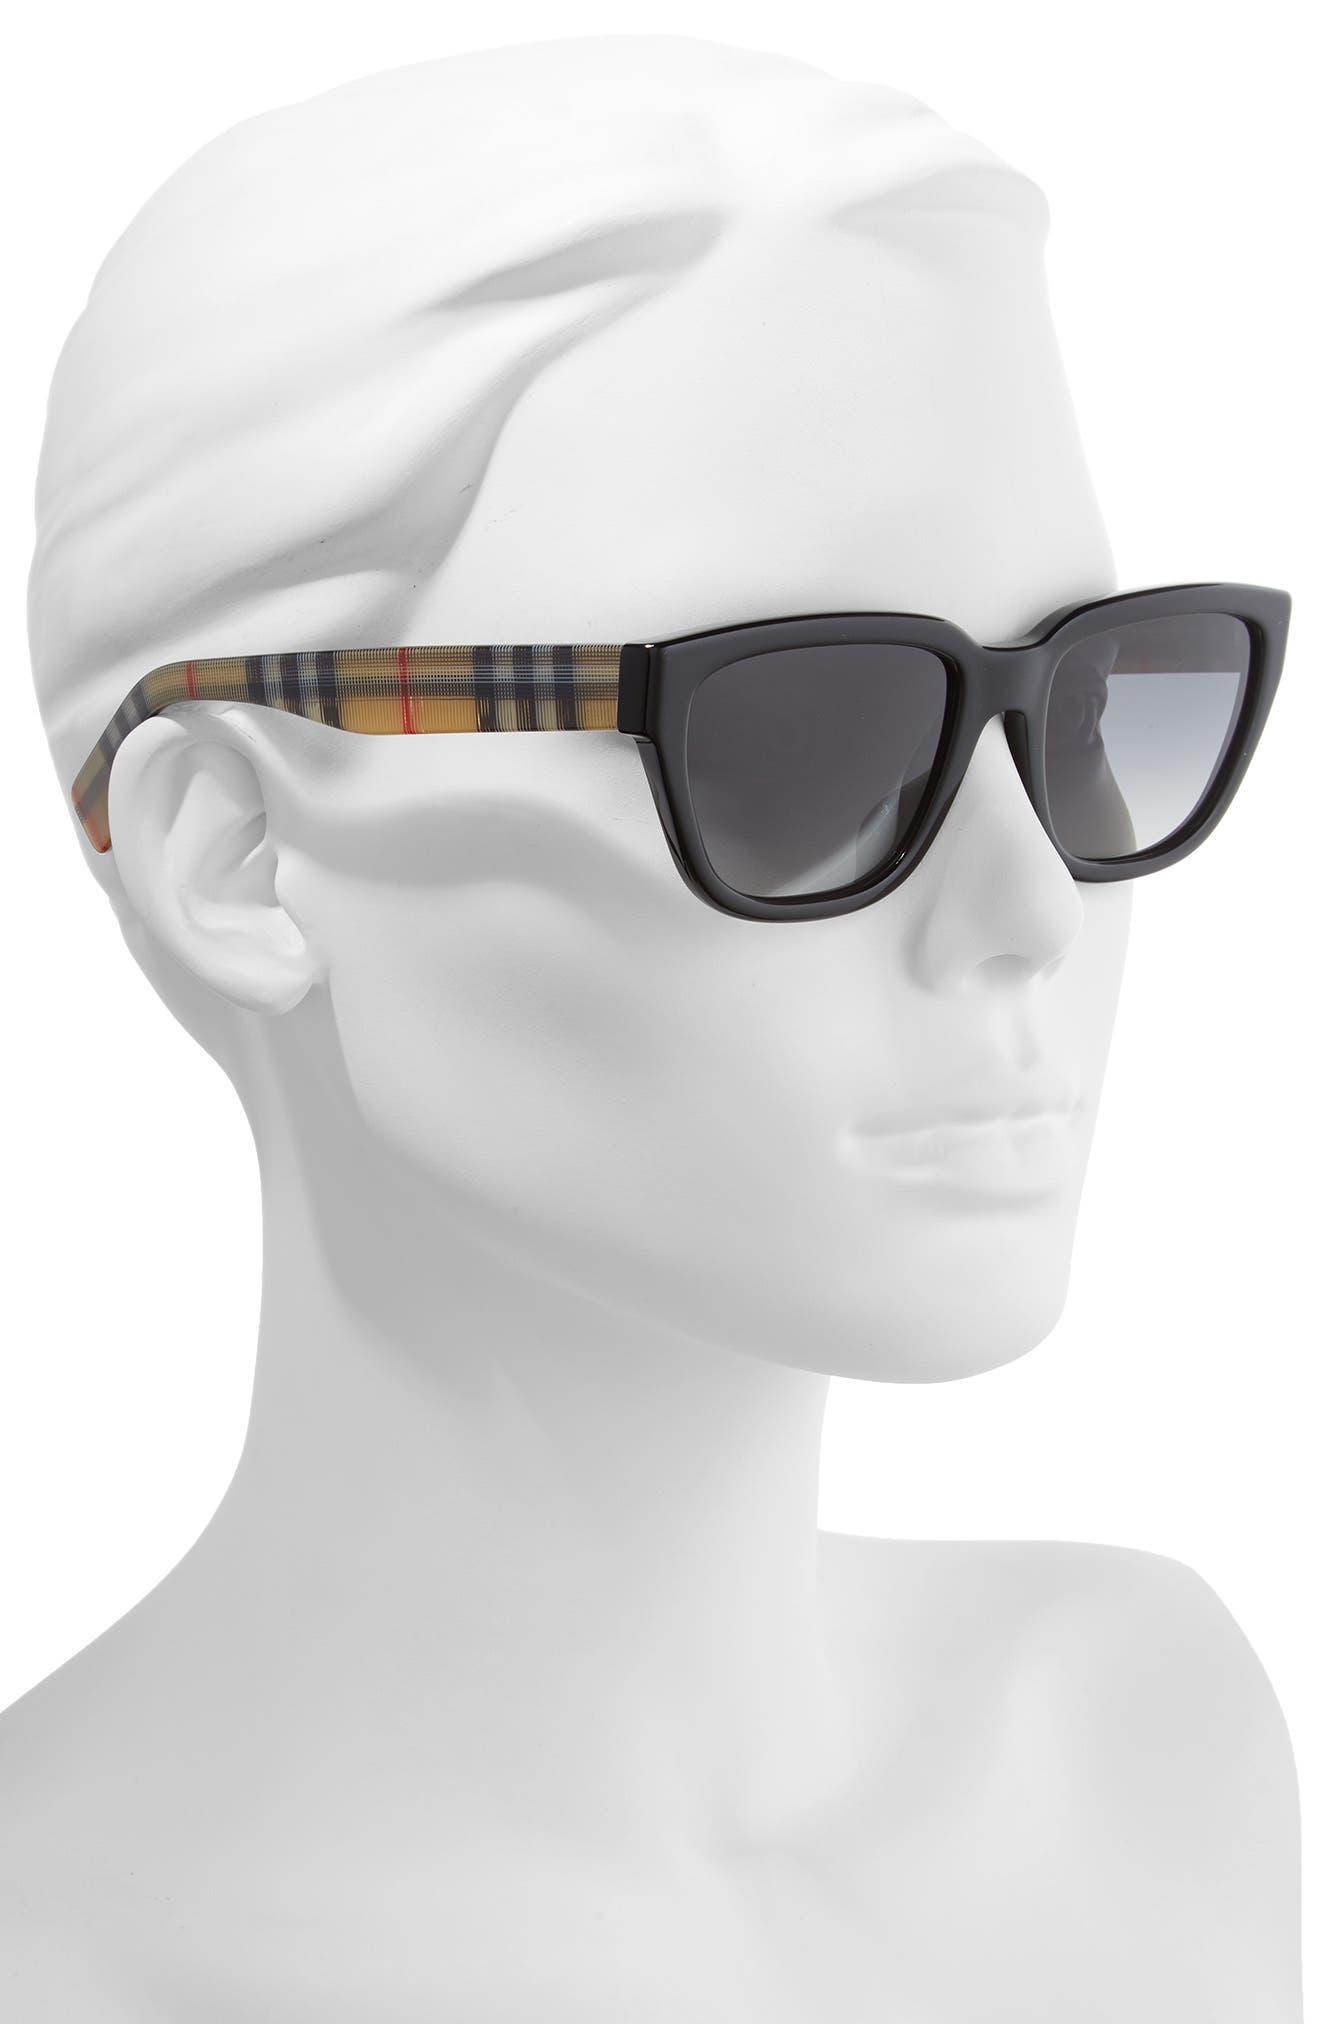 54mm Polarized Gradient Square Sunglasses,                             Alternate thumbnail 2, color,                             BLACK/ BLACK GRADIENT